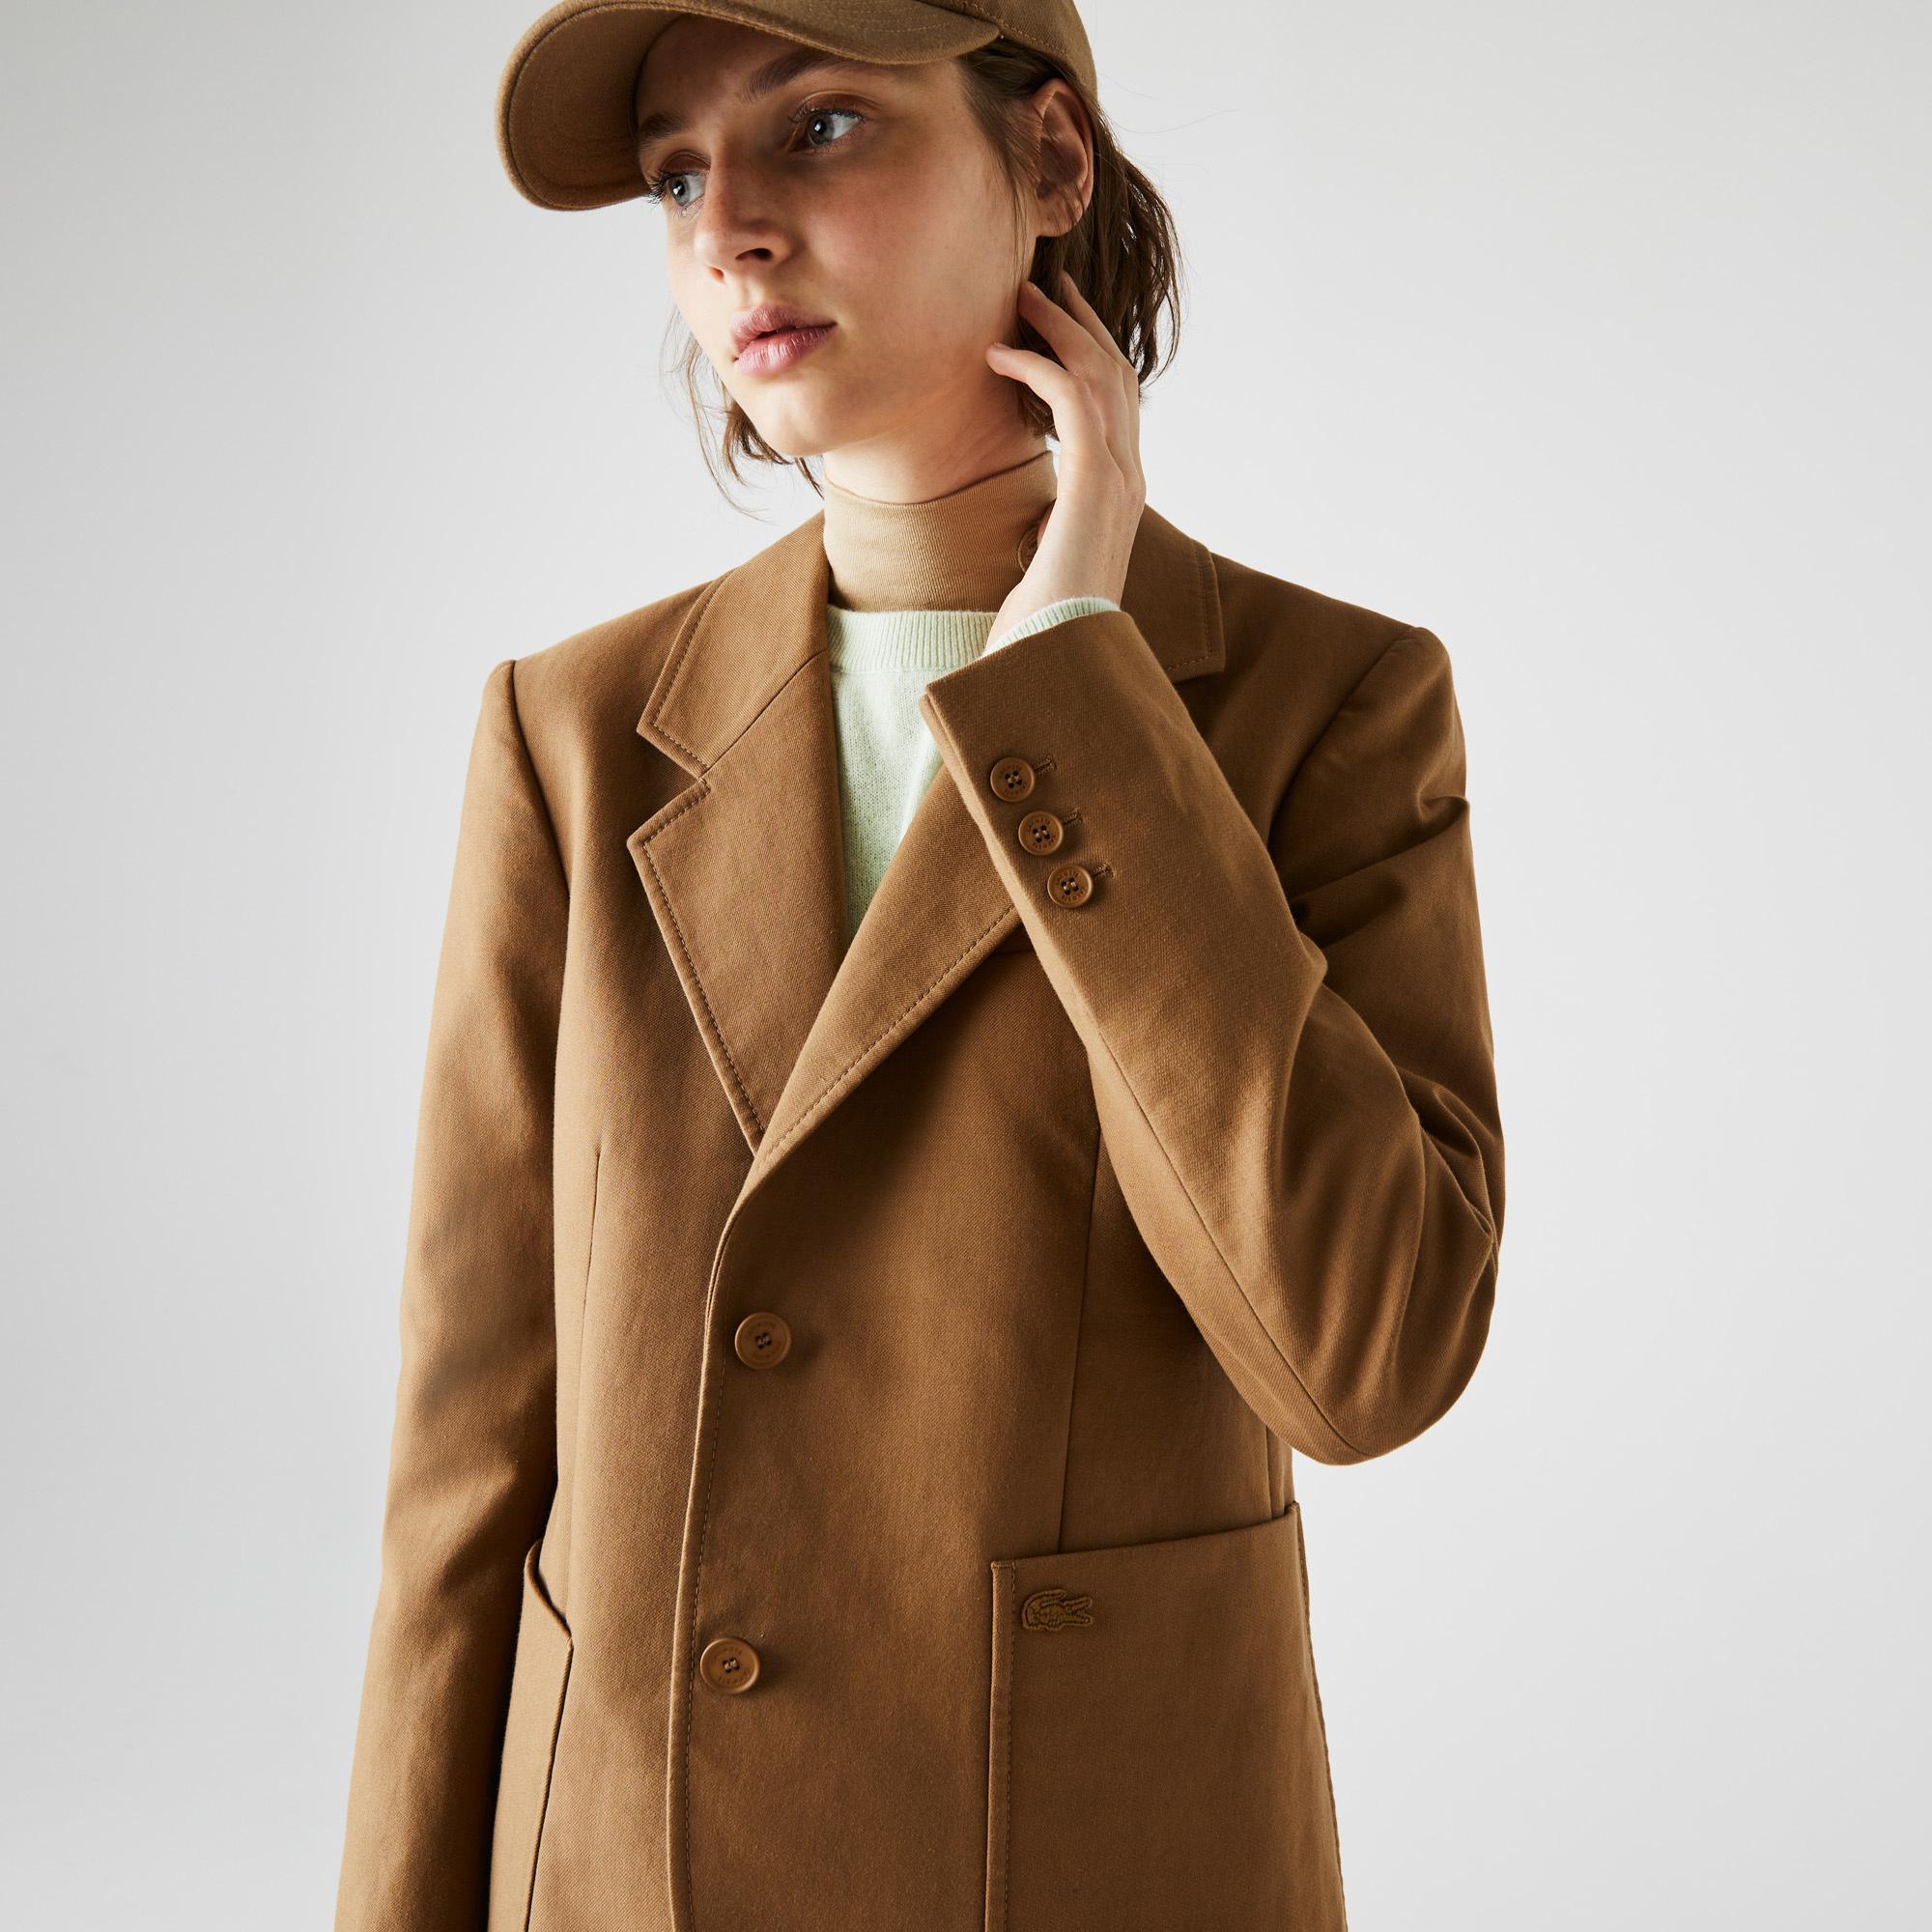 Lacoste Kadın Kahverengi Ceket